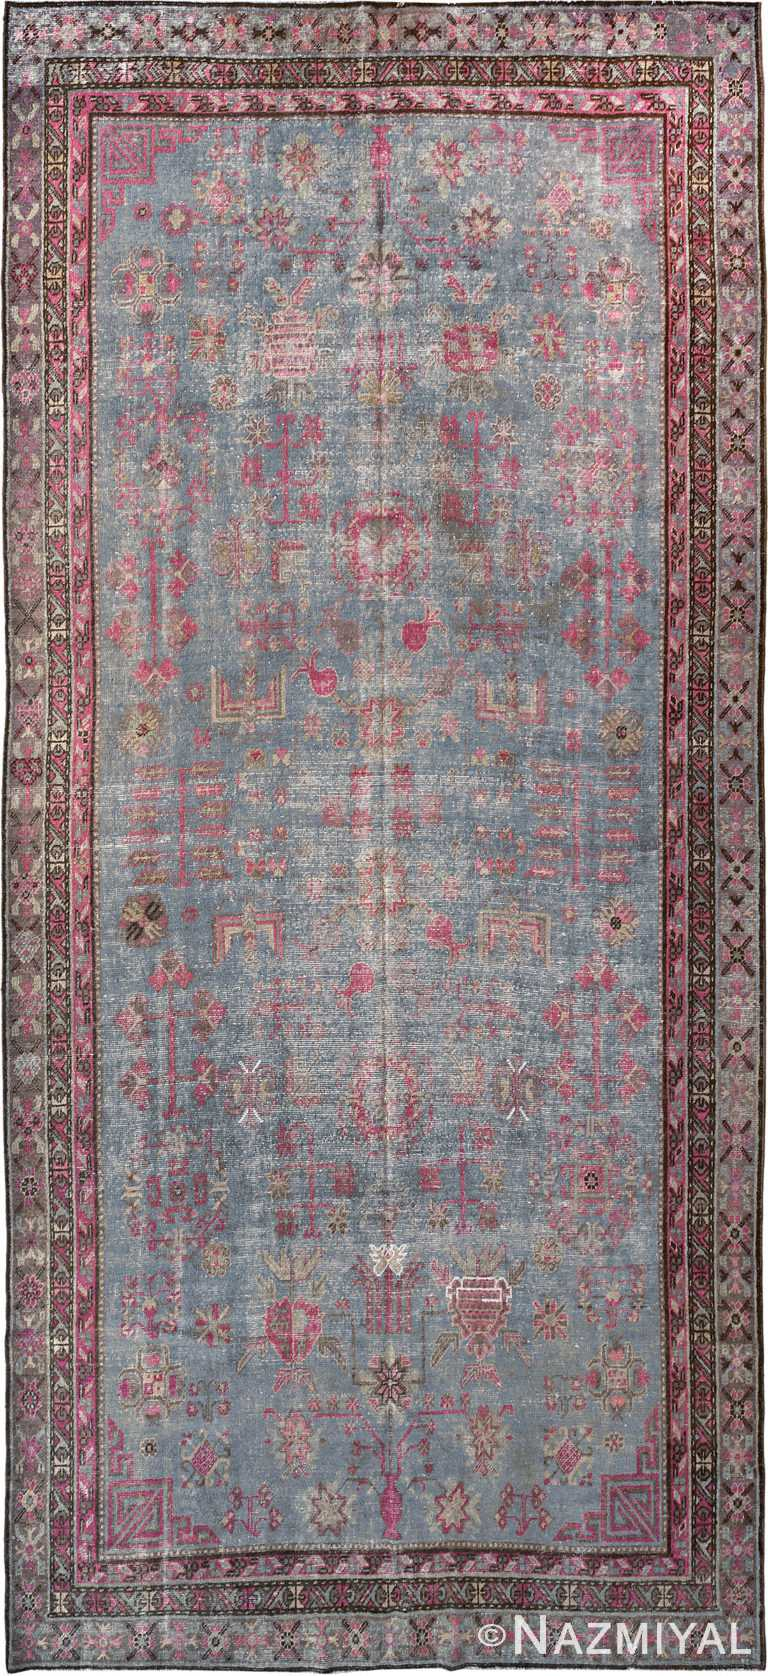 Antique Khotan Runner Rug Nazmiyal